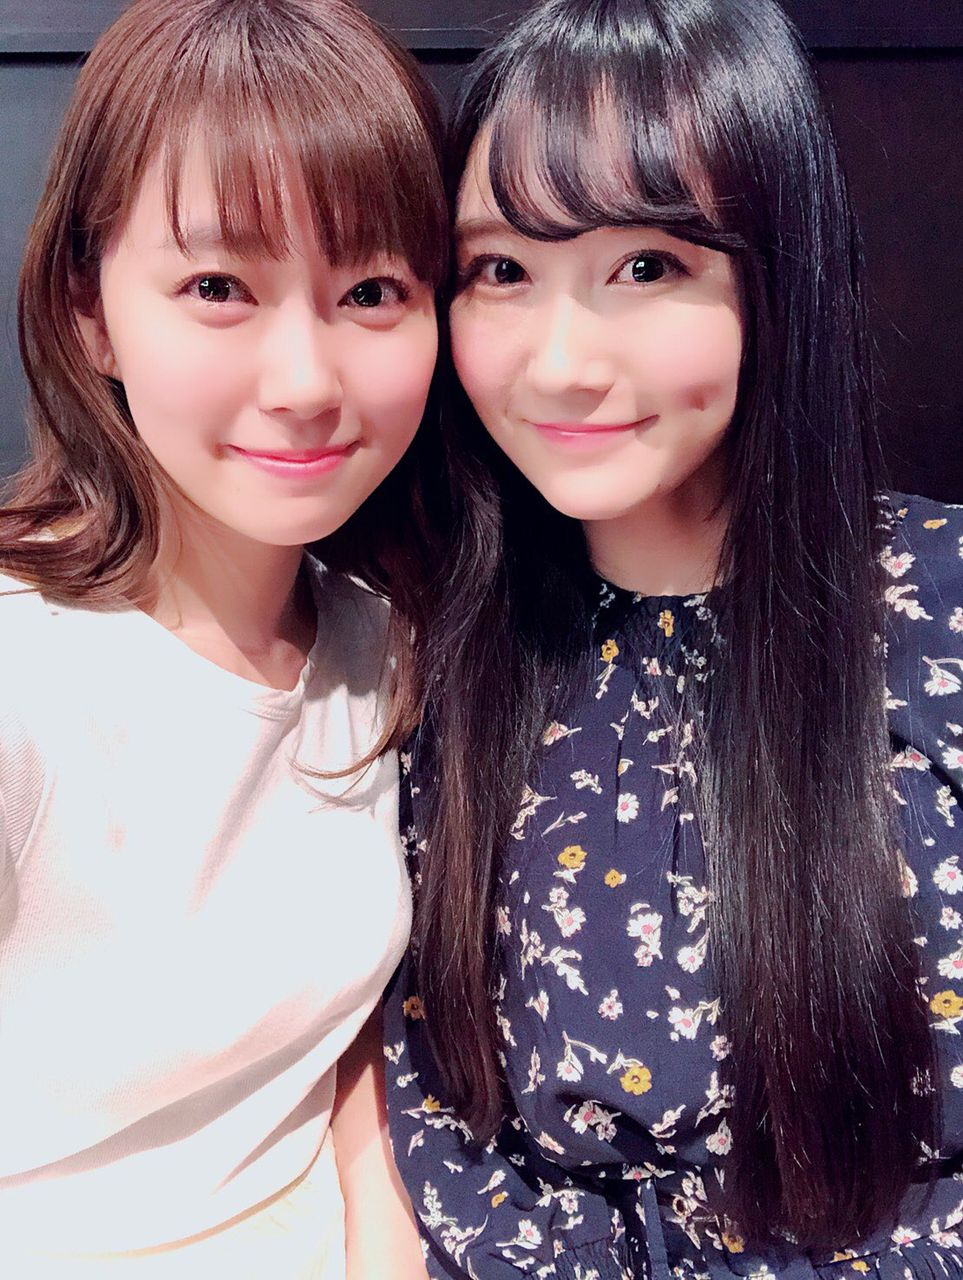 【NMB48卒業生】ふぅみる2ショット写真キタ――(゚∀゚)――!!【矢倉楓子・渡辺美優紀】